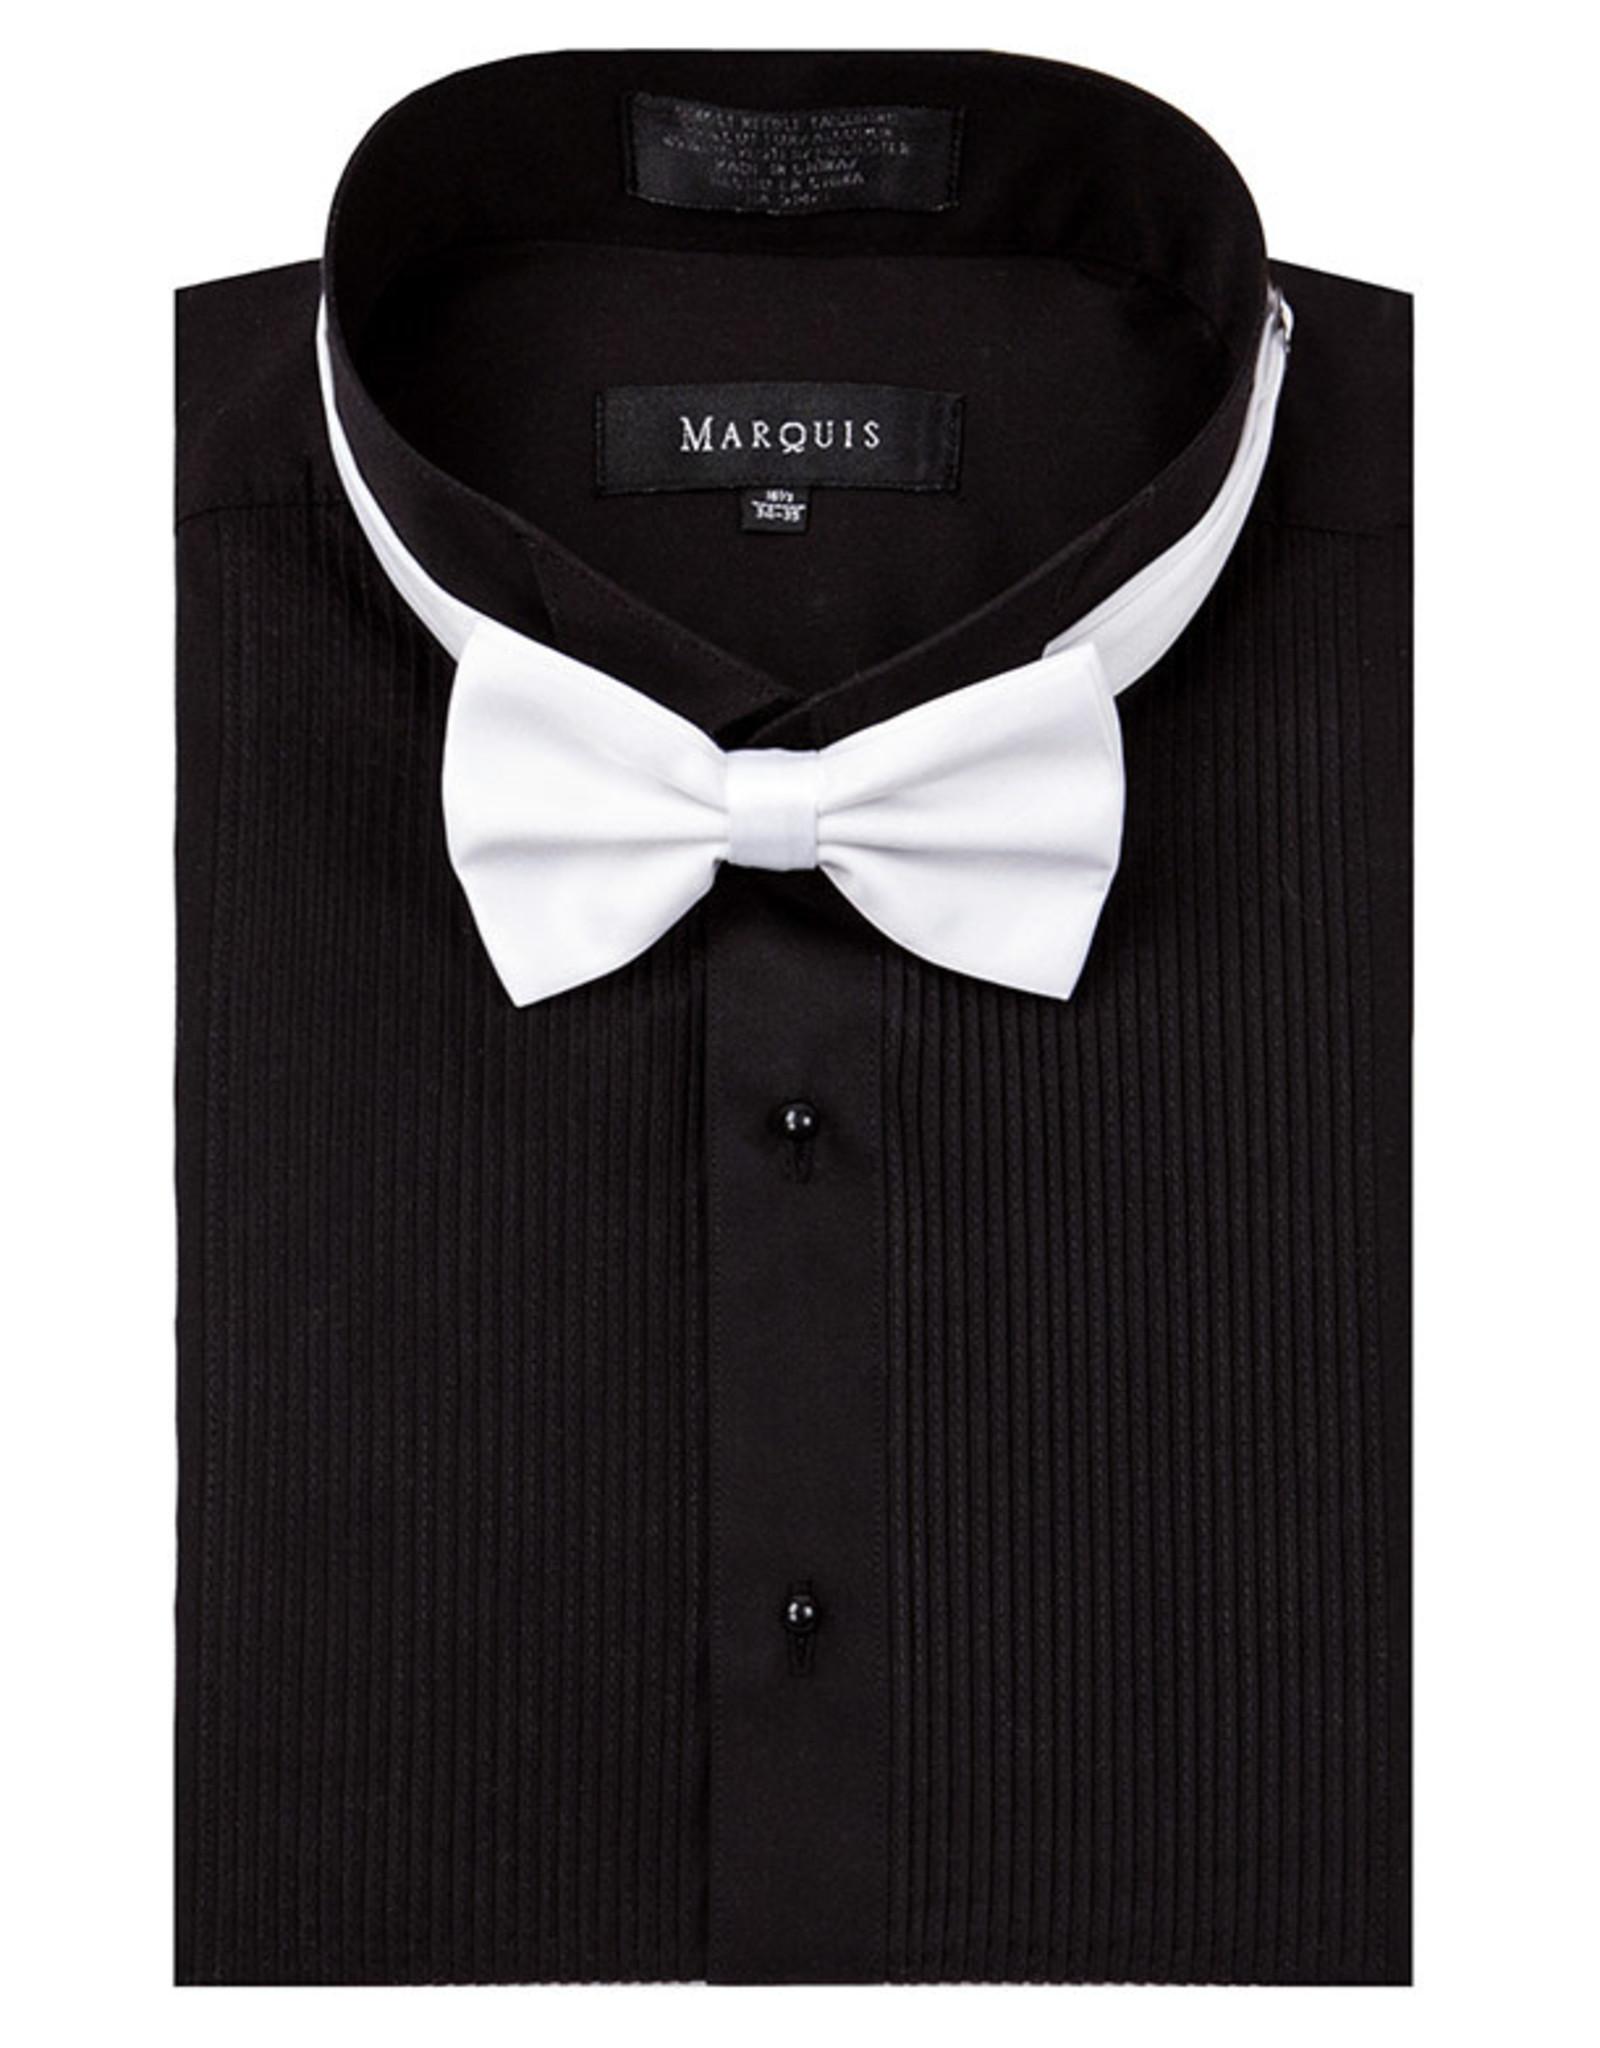 Marquis Tuxedo Dress Shirt Regular Fit Pleated Black